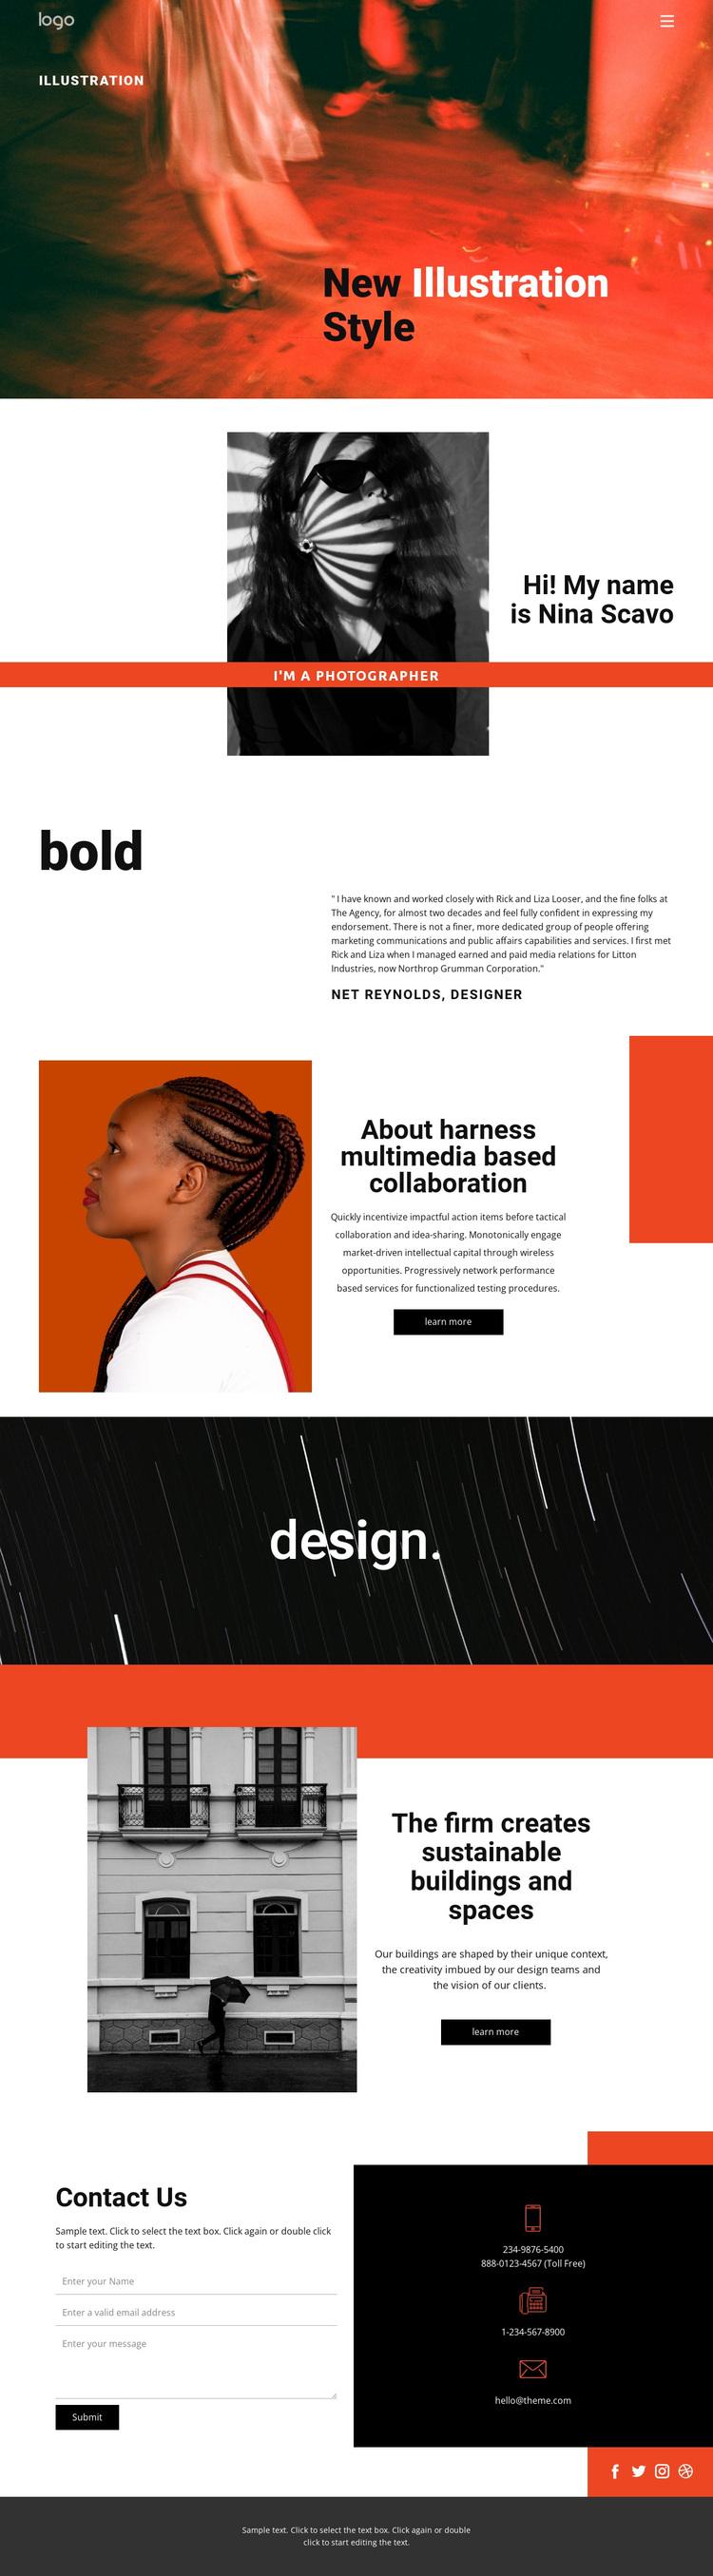 Illustration styles for art  Joomla Page Builder